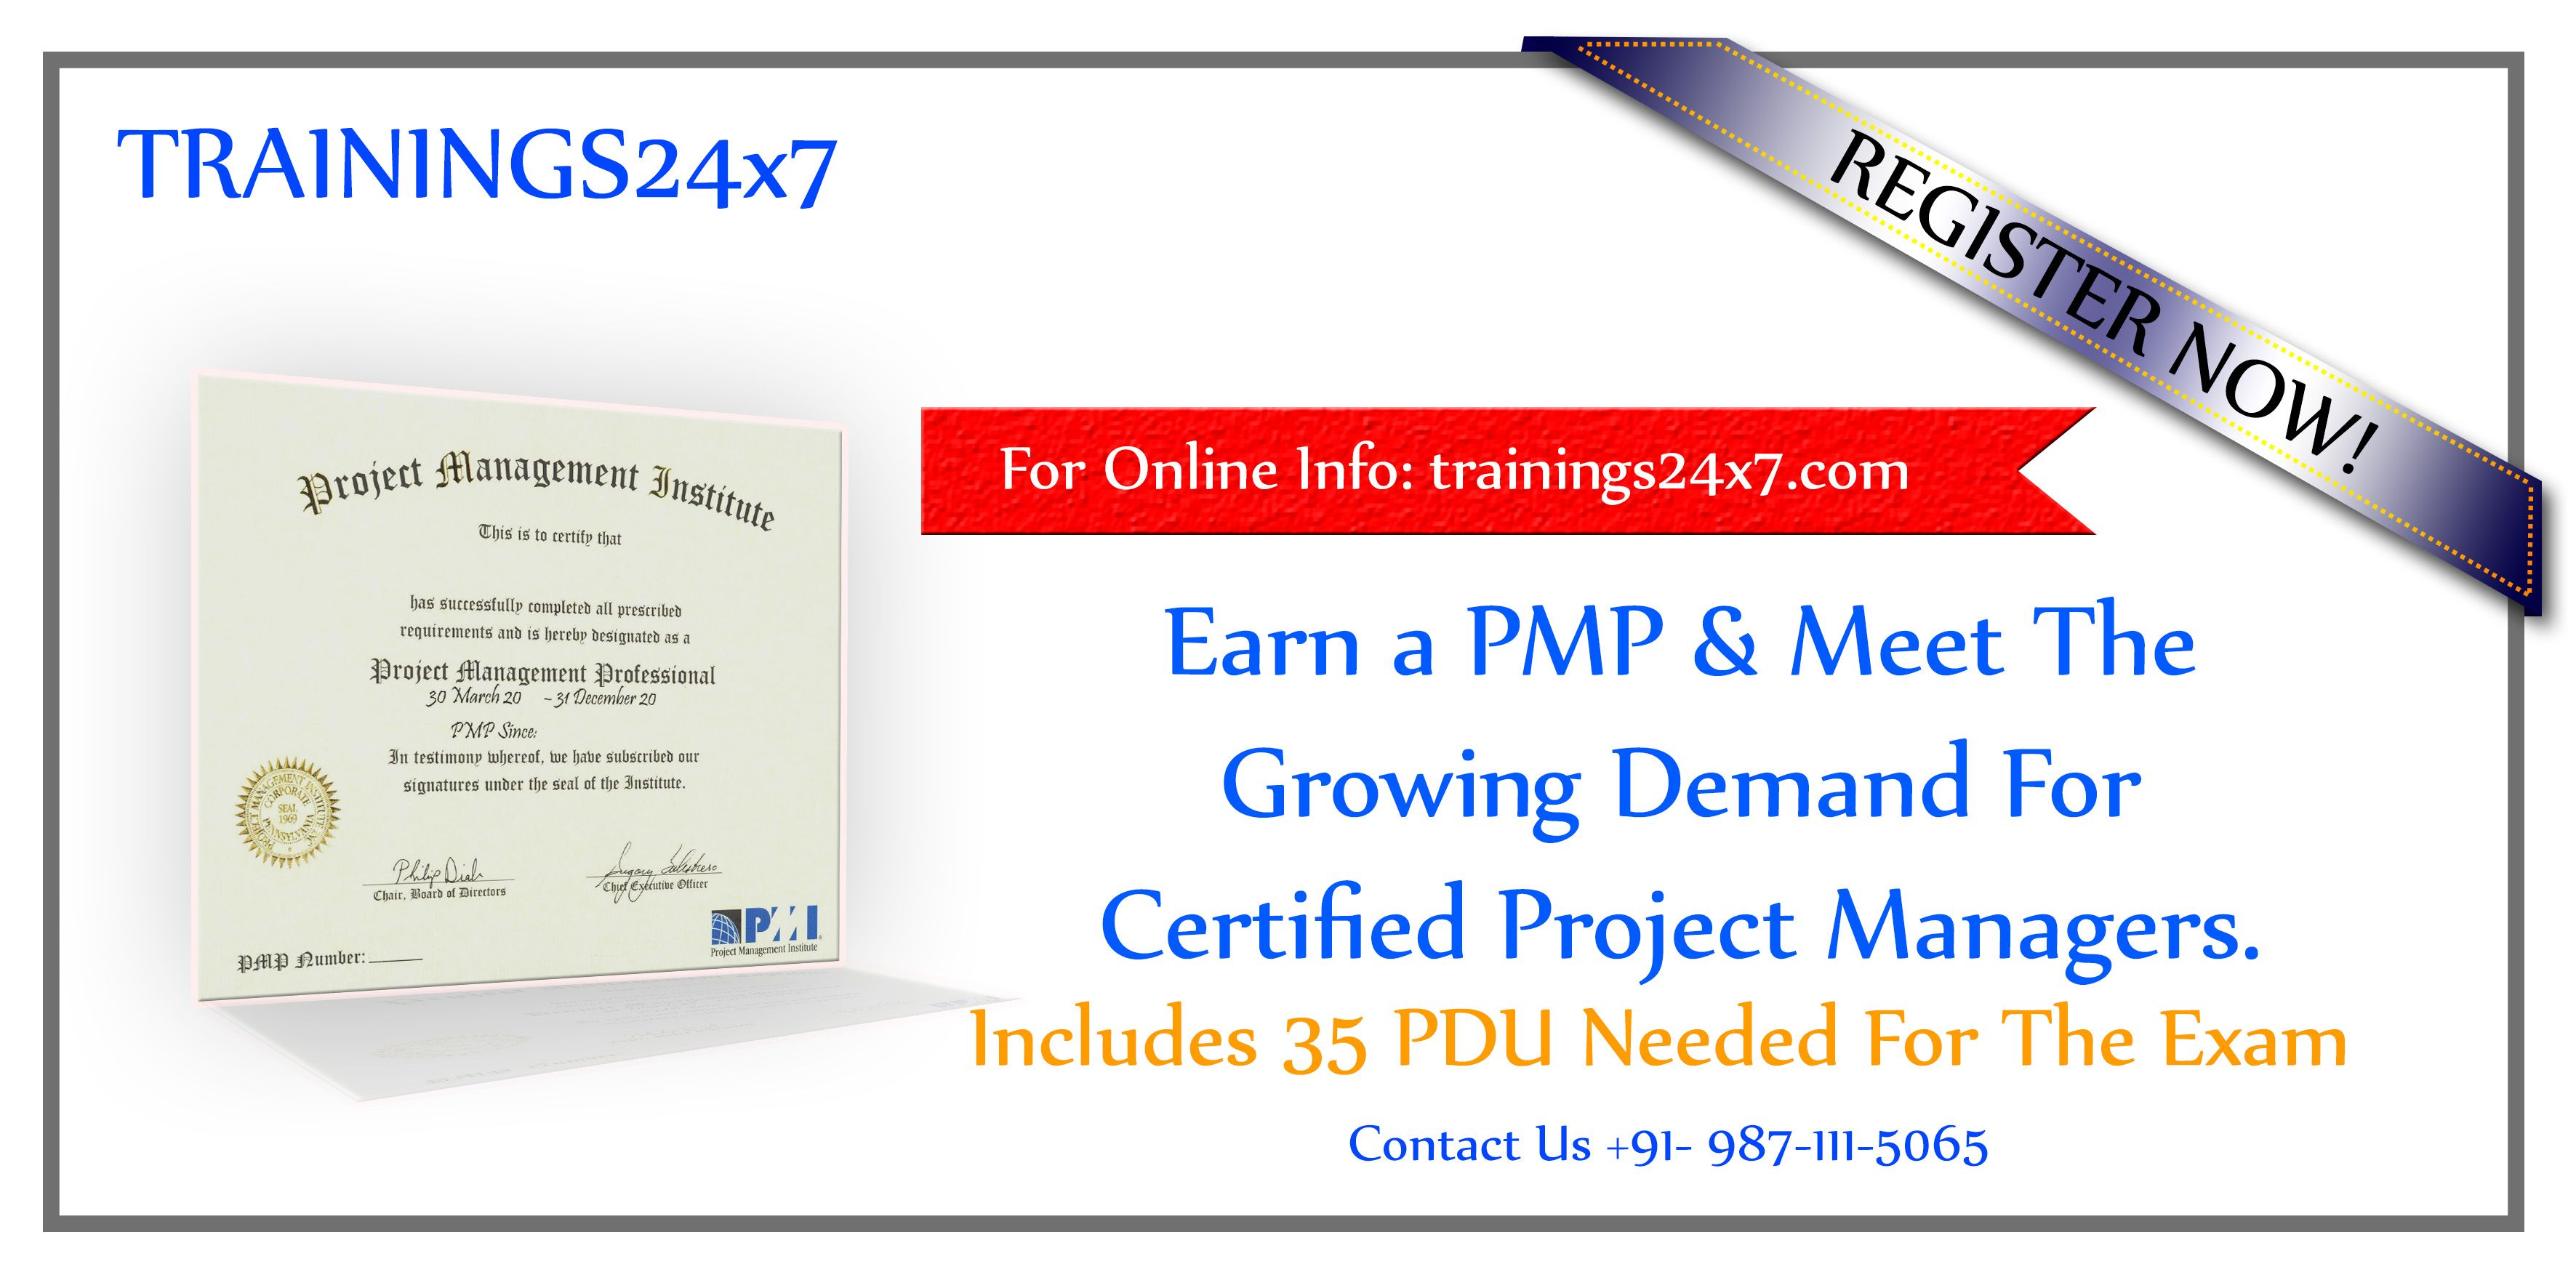 Pmp Certification Hyderabad Pass Guaranteed